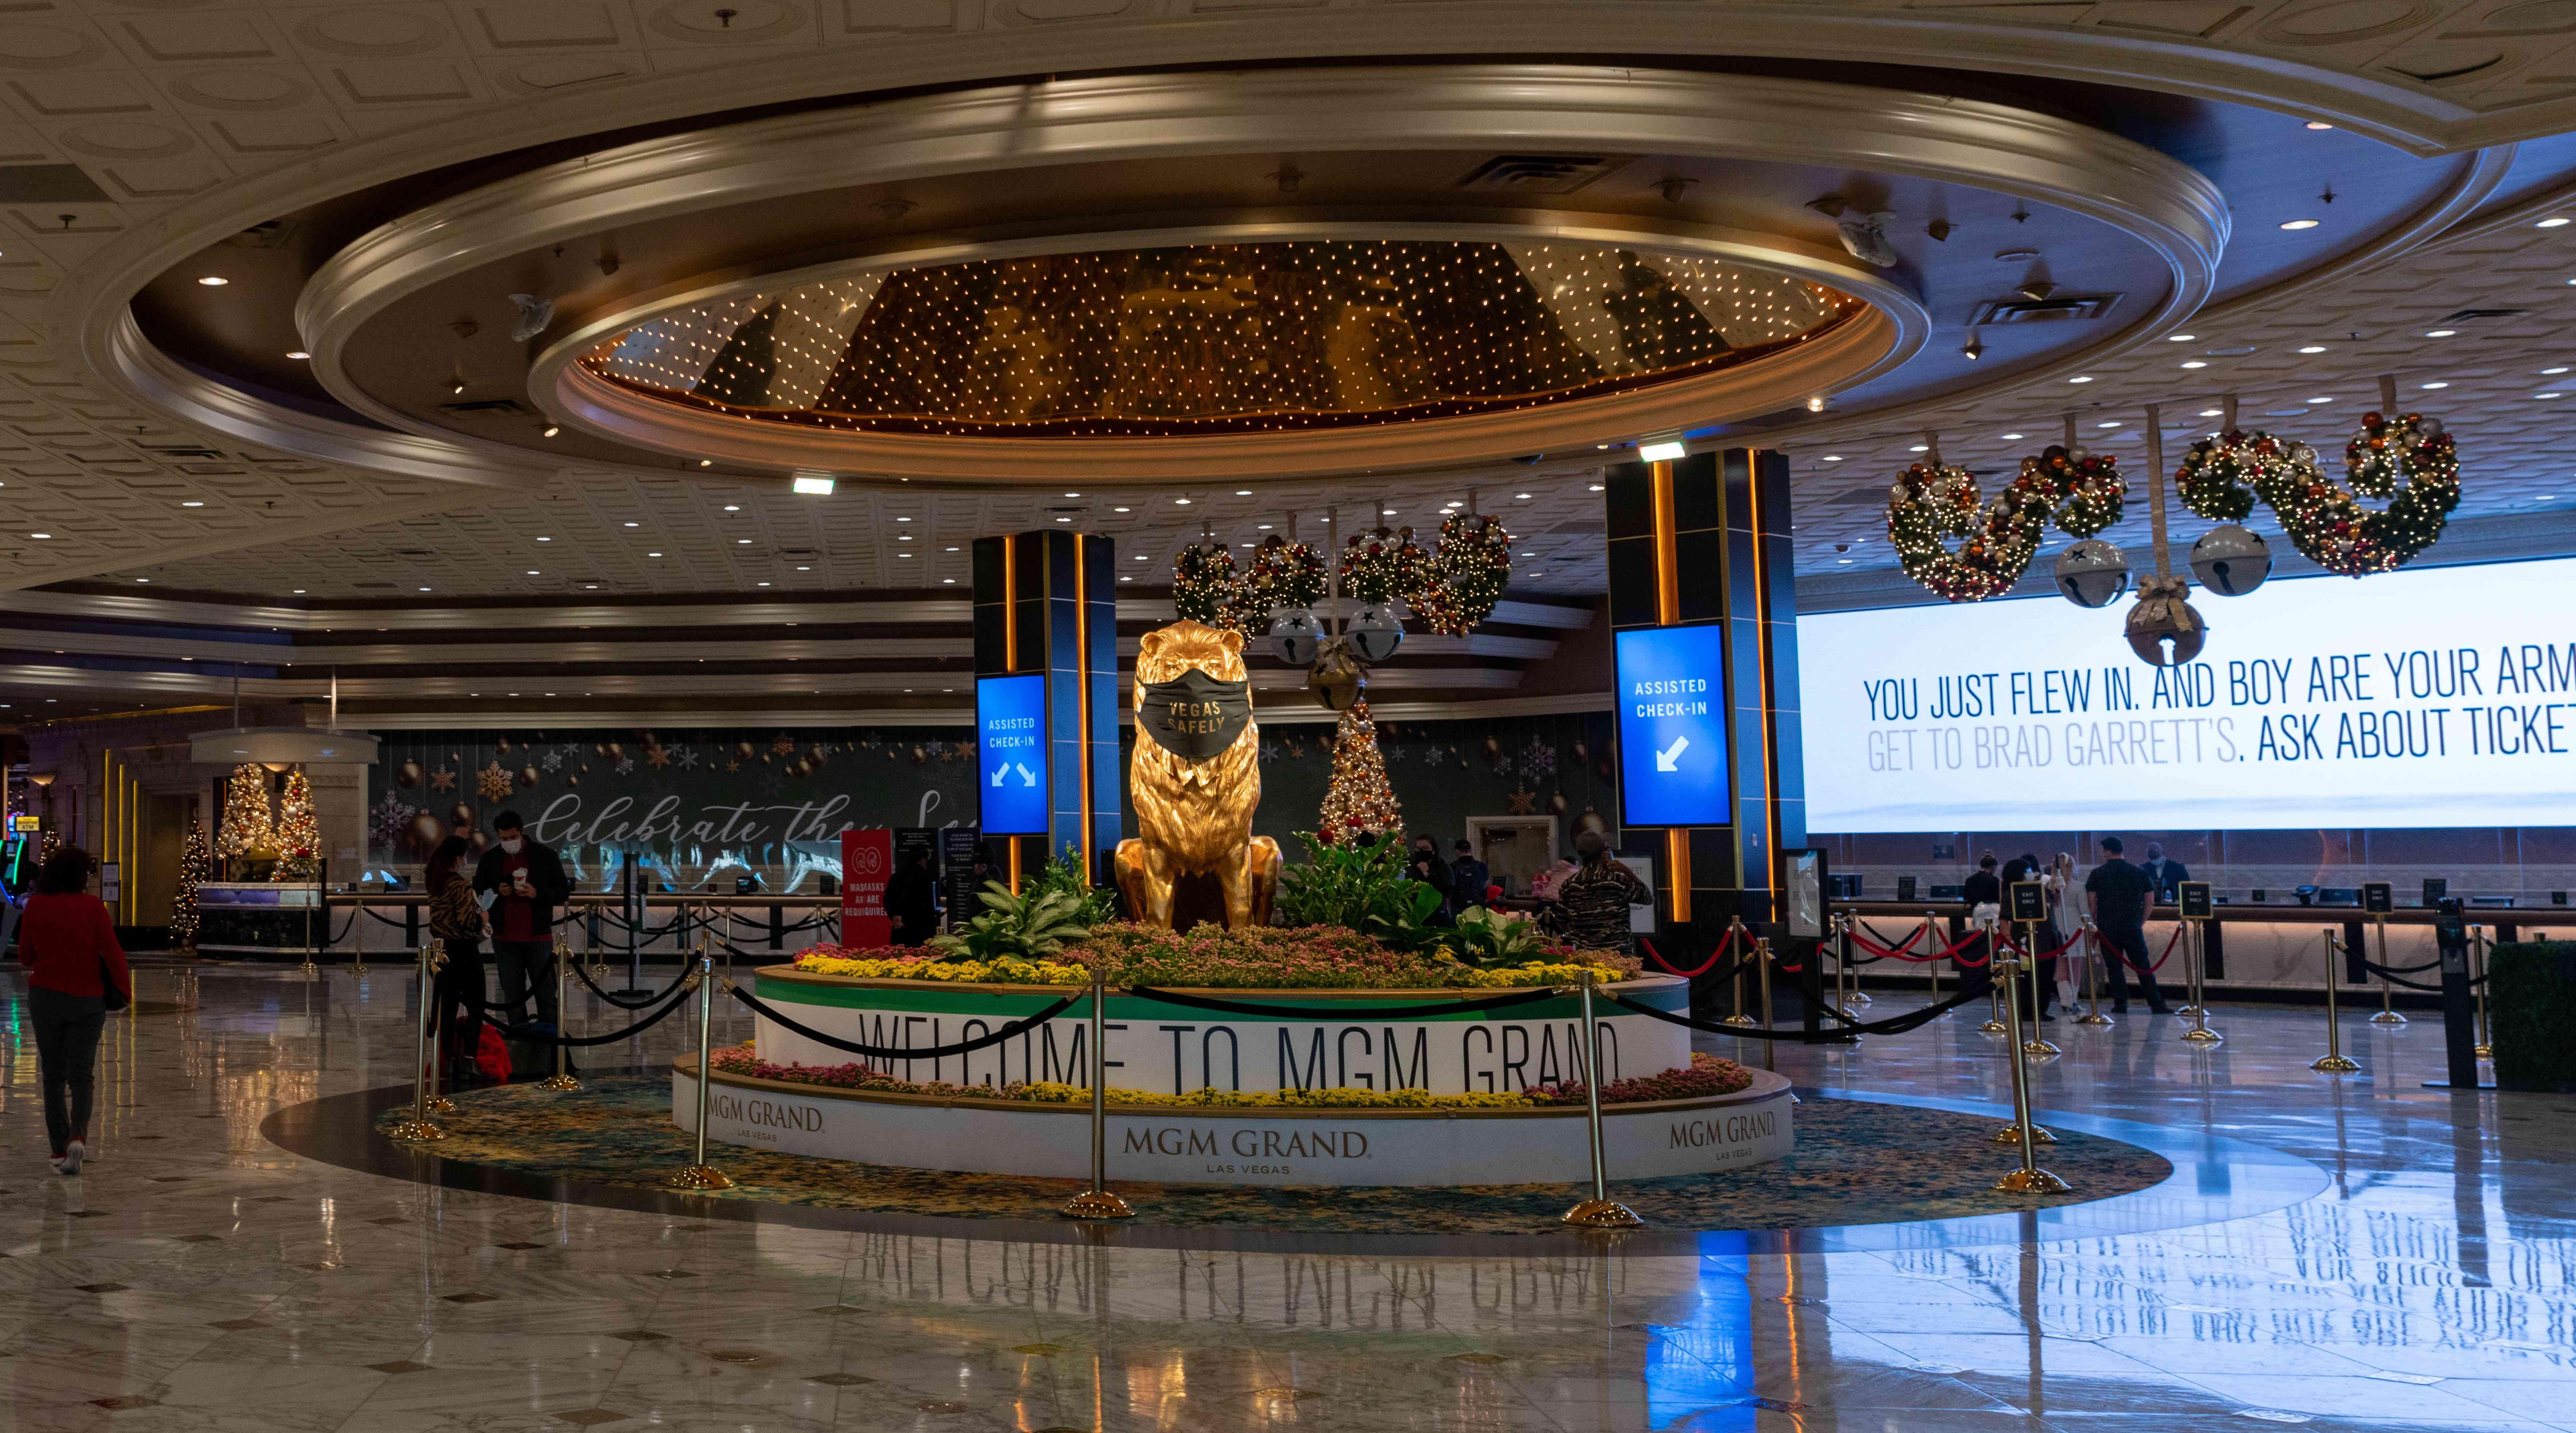 MGM Grand in Las Vegas, NV